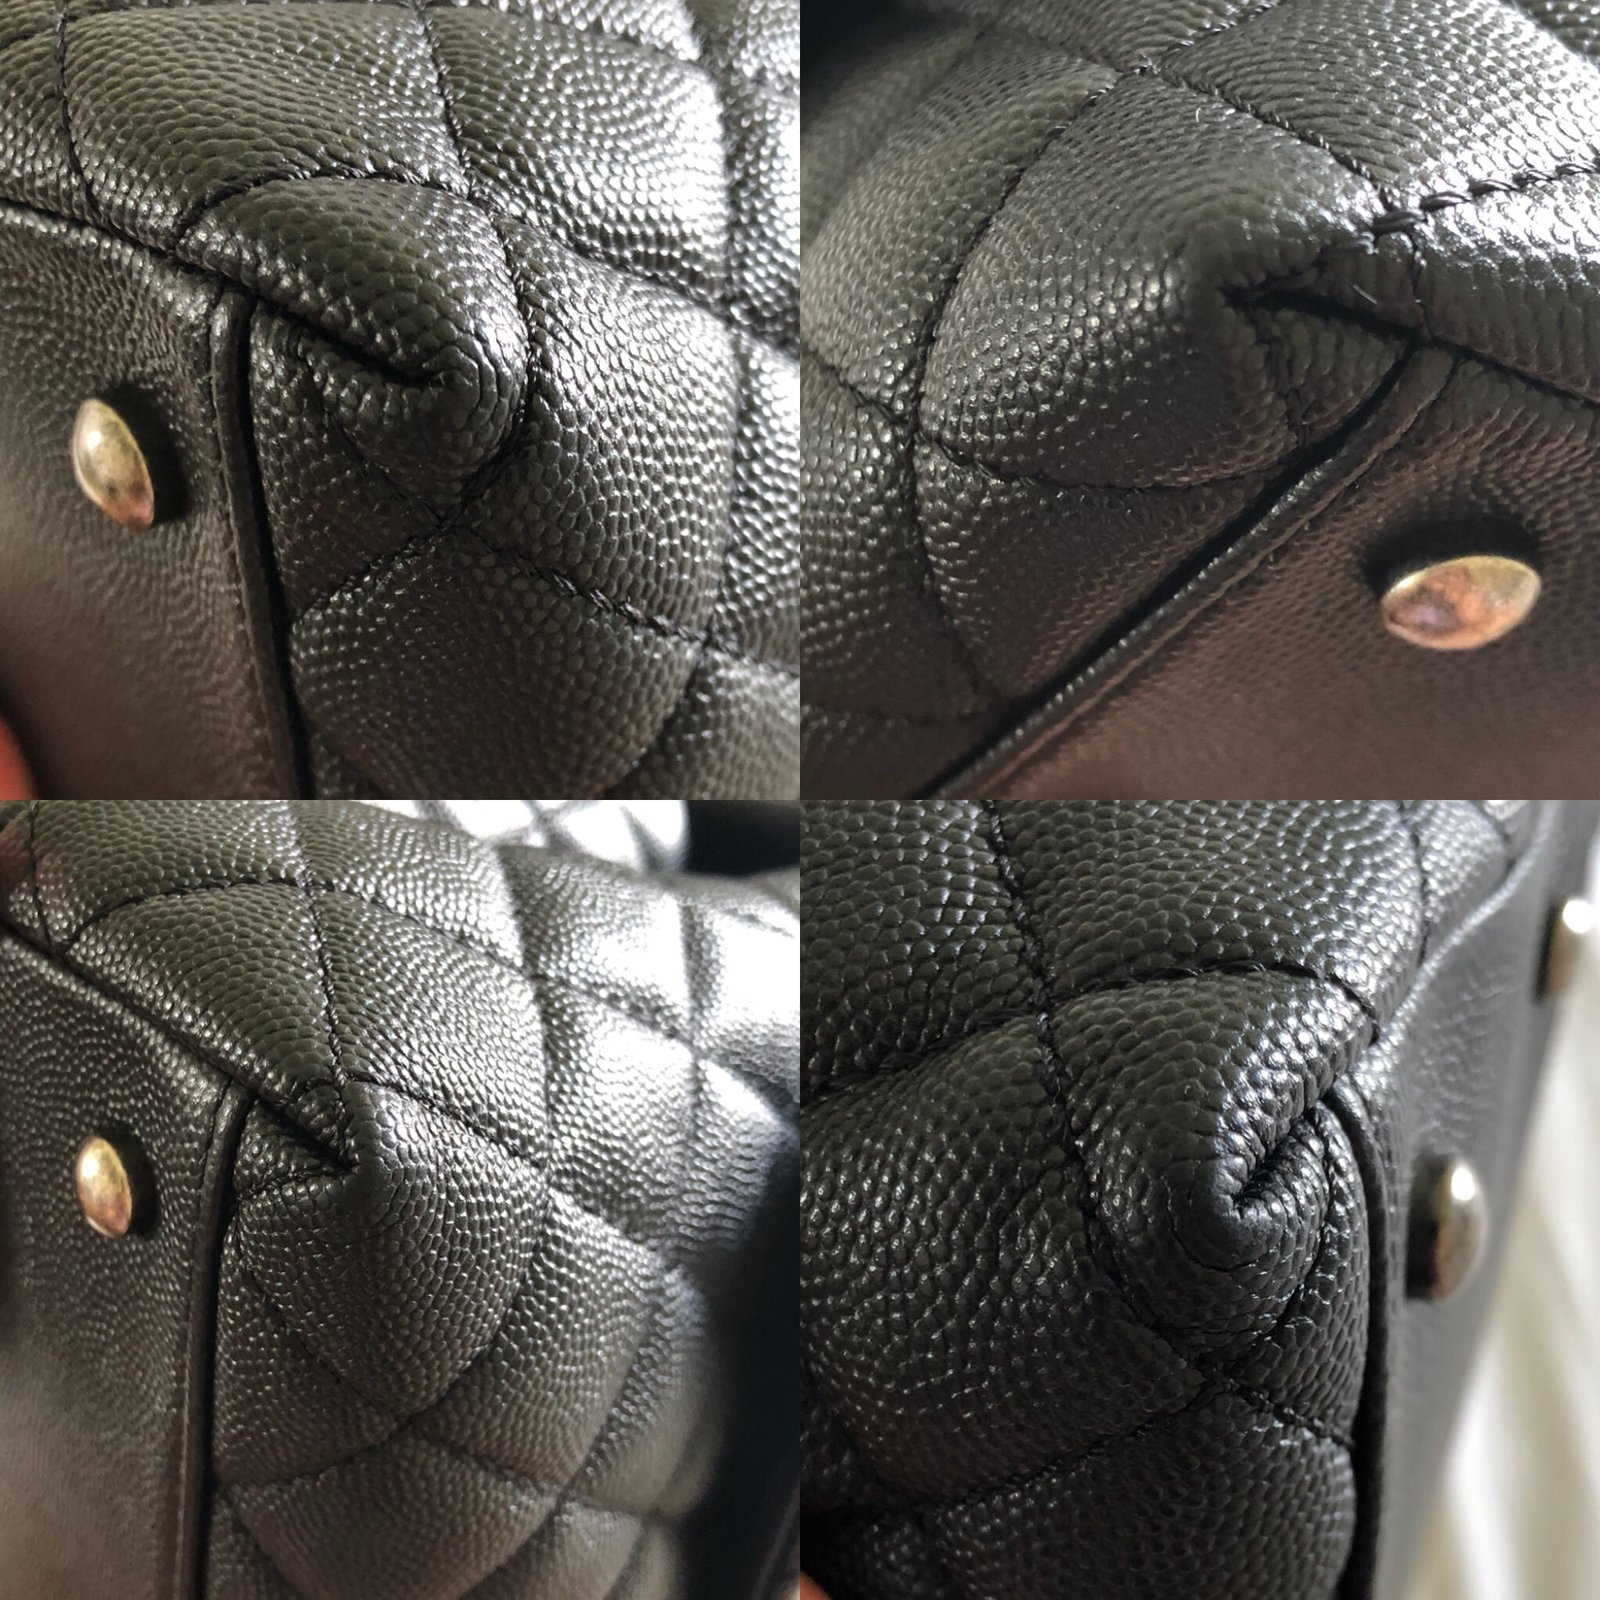 bb48f3966e463c Chanel Coco Handle in Ruthenium Hardware Handbags Leather Black ref.75133 - Joli  Closet